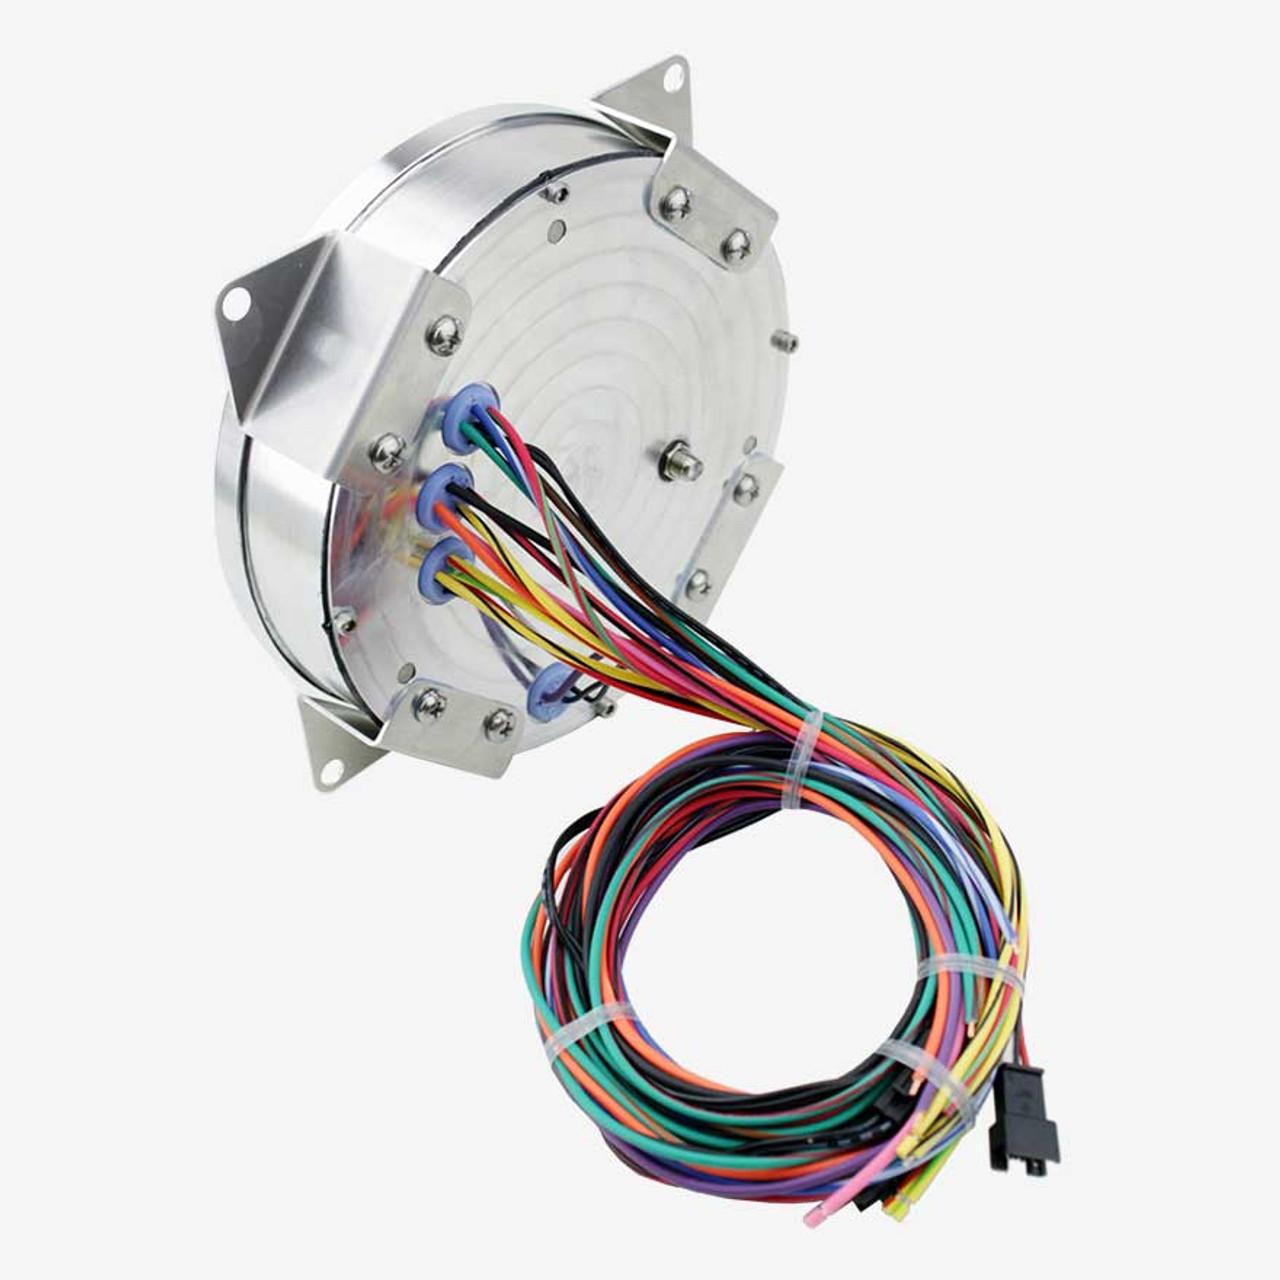 "5-1/2"" CJ Jeep GPS Speedometer Cluster 90mph with Tachometer- Speedo, Fuel Level, Temp, Tach"